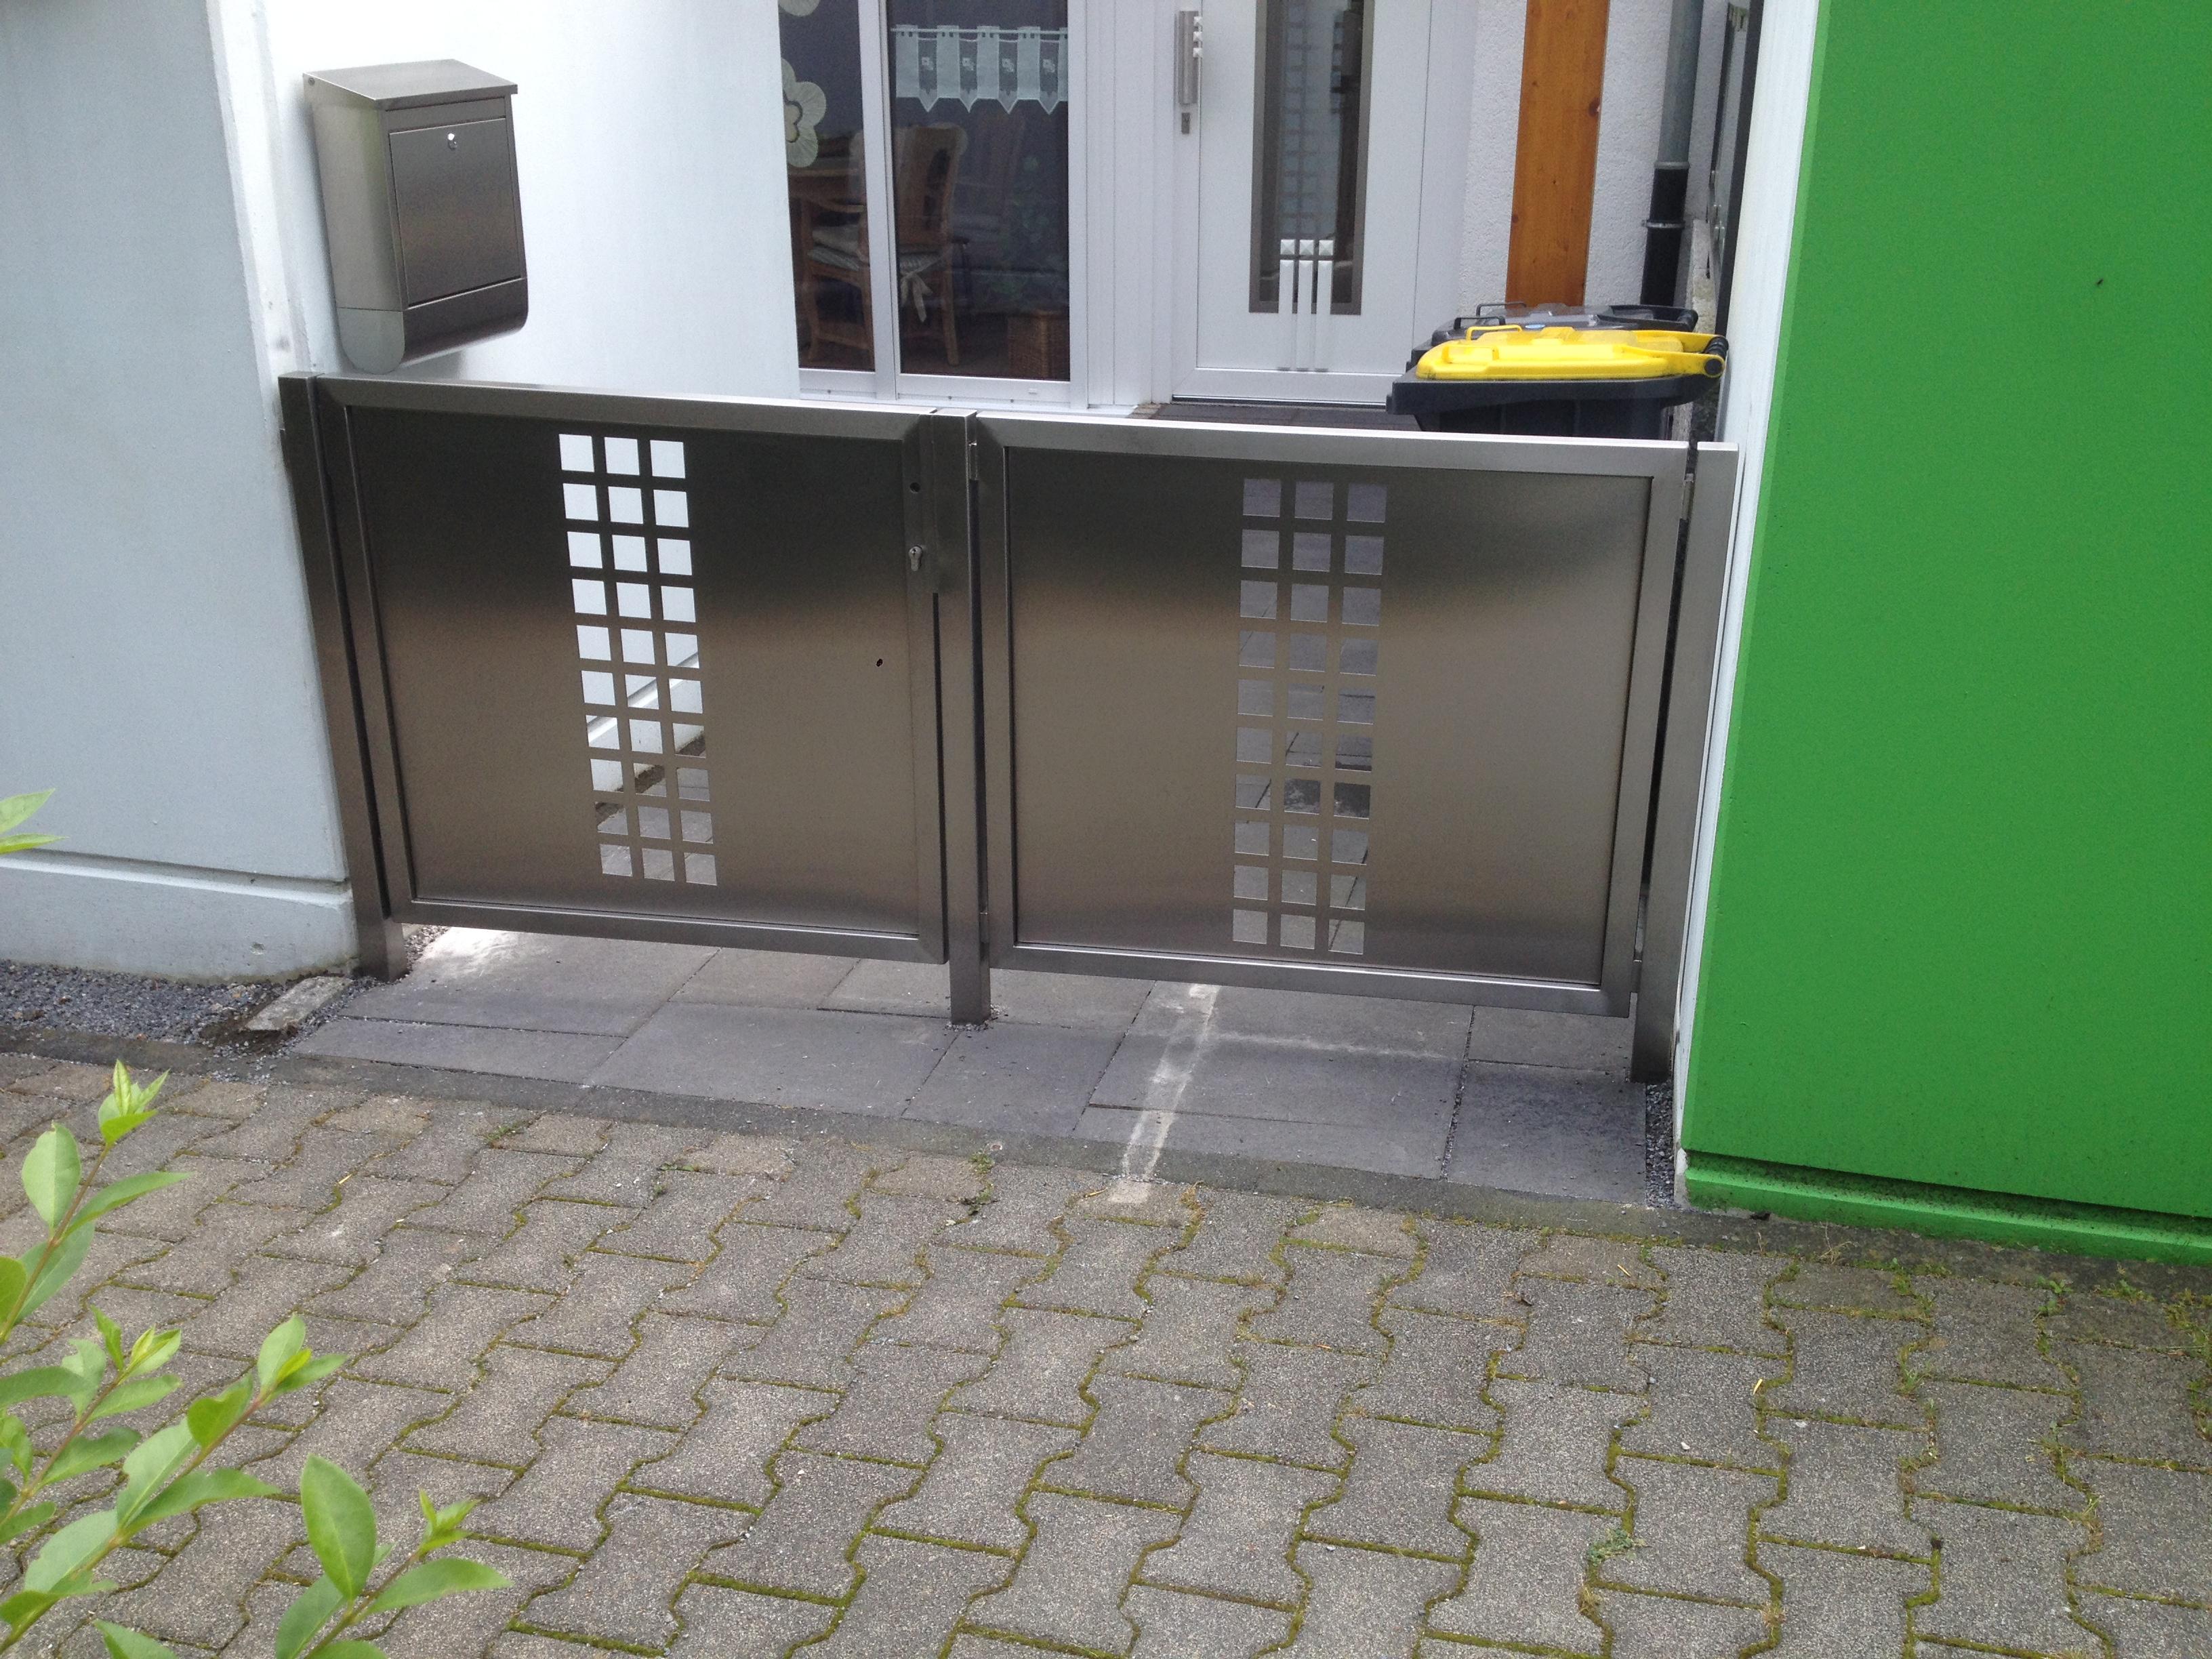 Metallbau Wuppertal Gelander Edelstahltor Mit Lochblechfullung